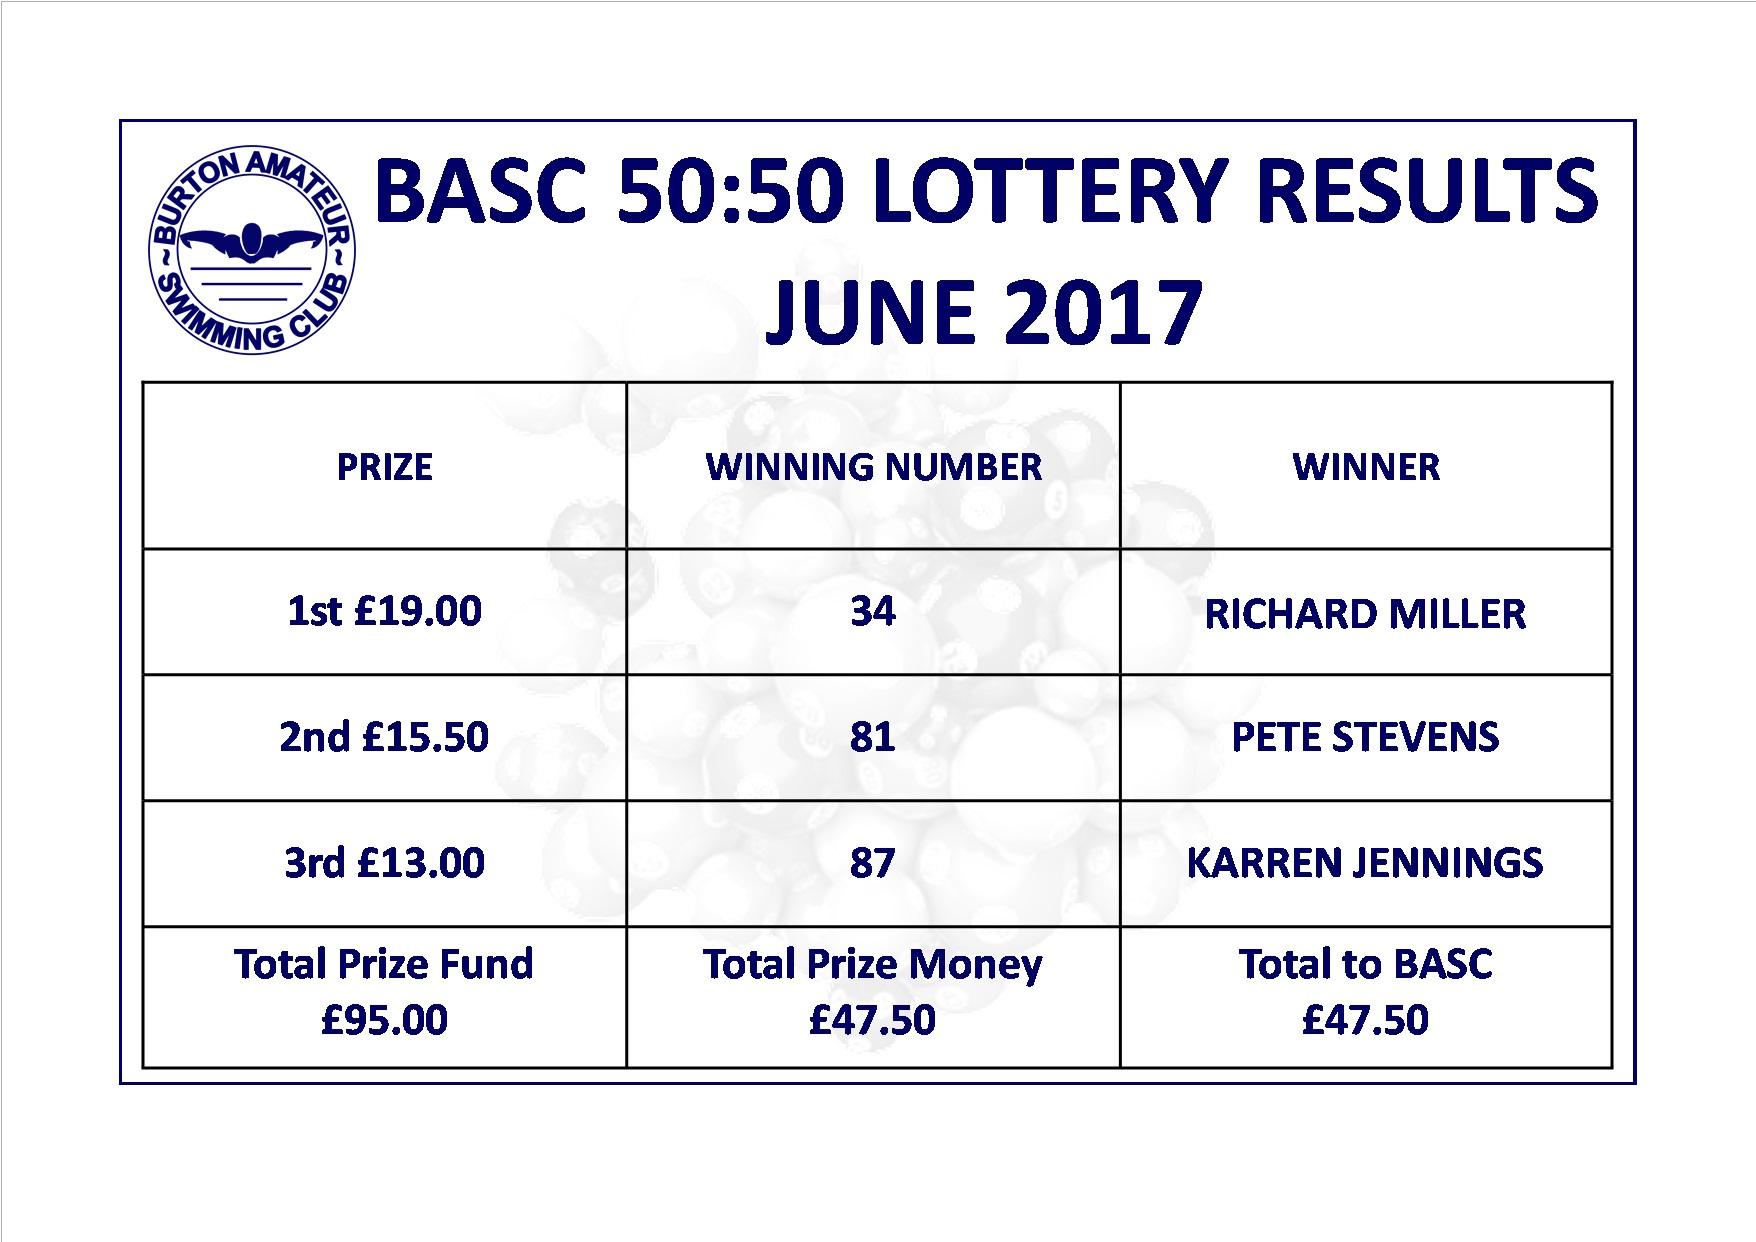 Burton Amateur Swimming Club Lottery Results June 2017